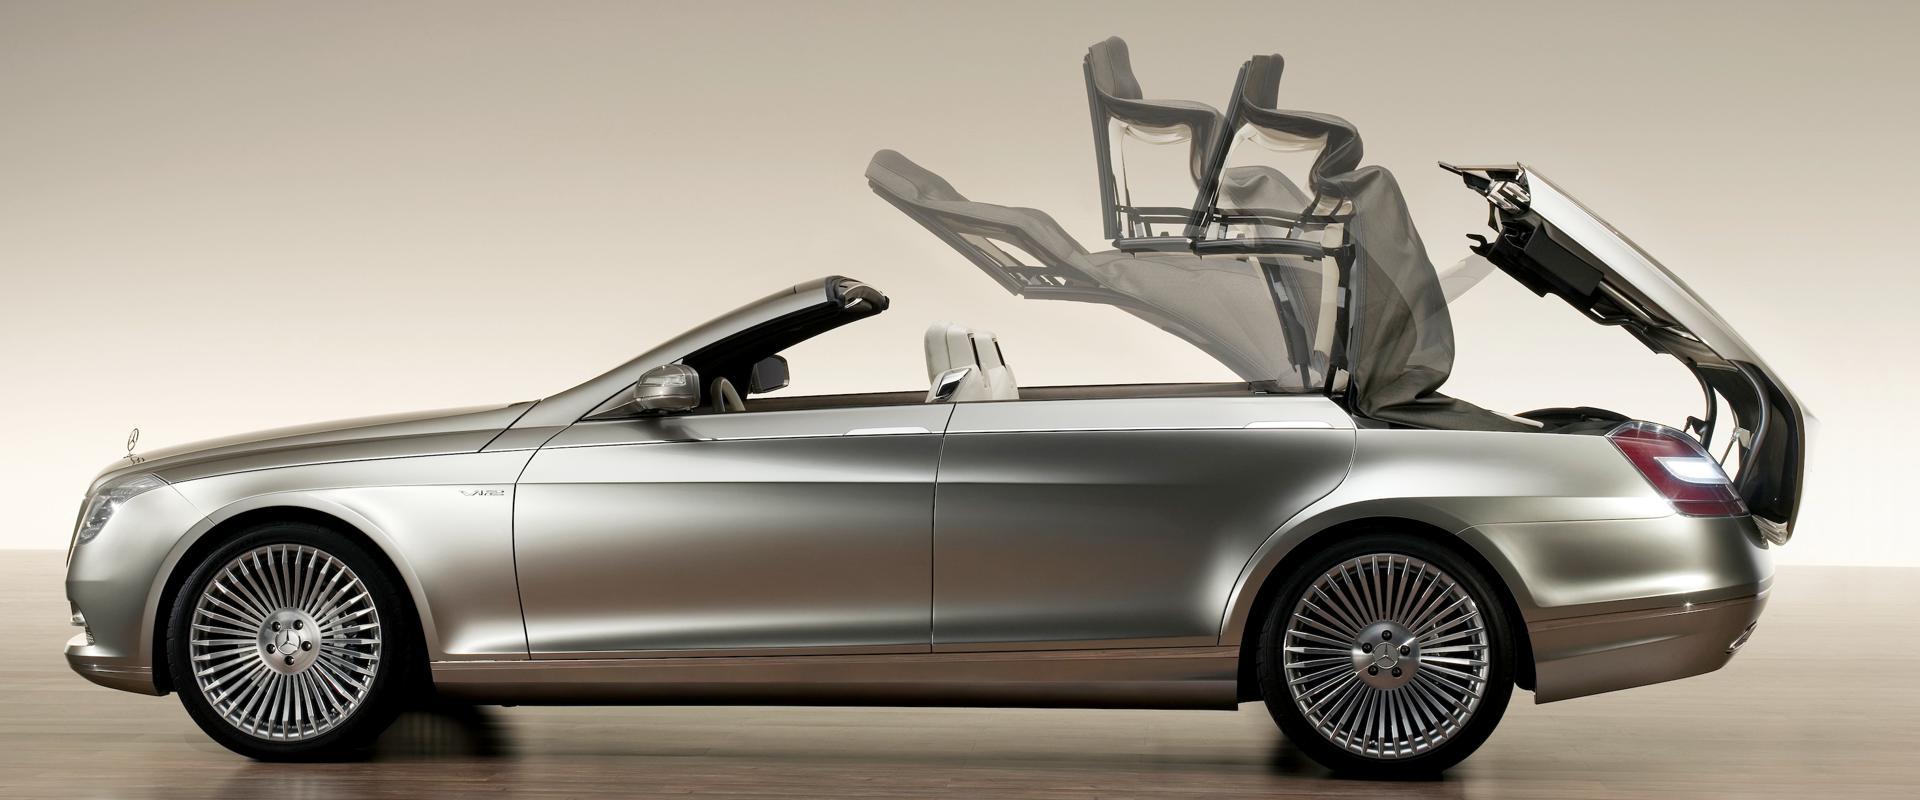 Najluksuzniji Mercedesov kabriolet spreman za Frankfurt